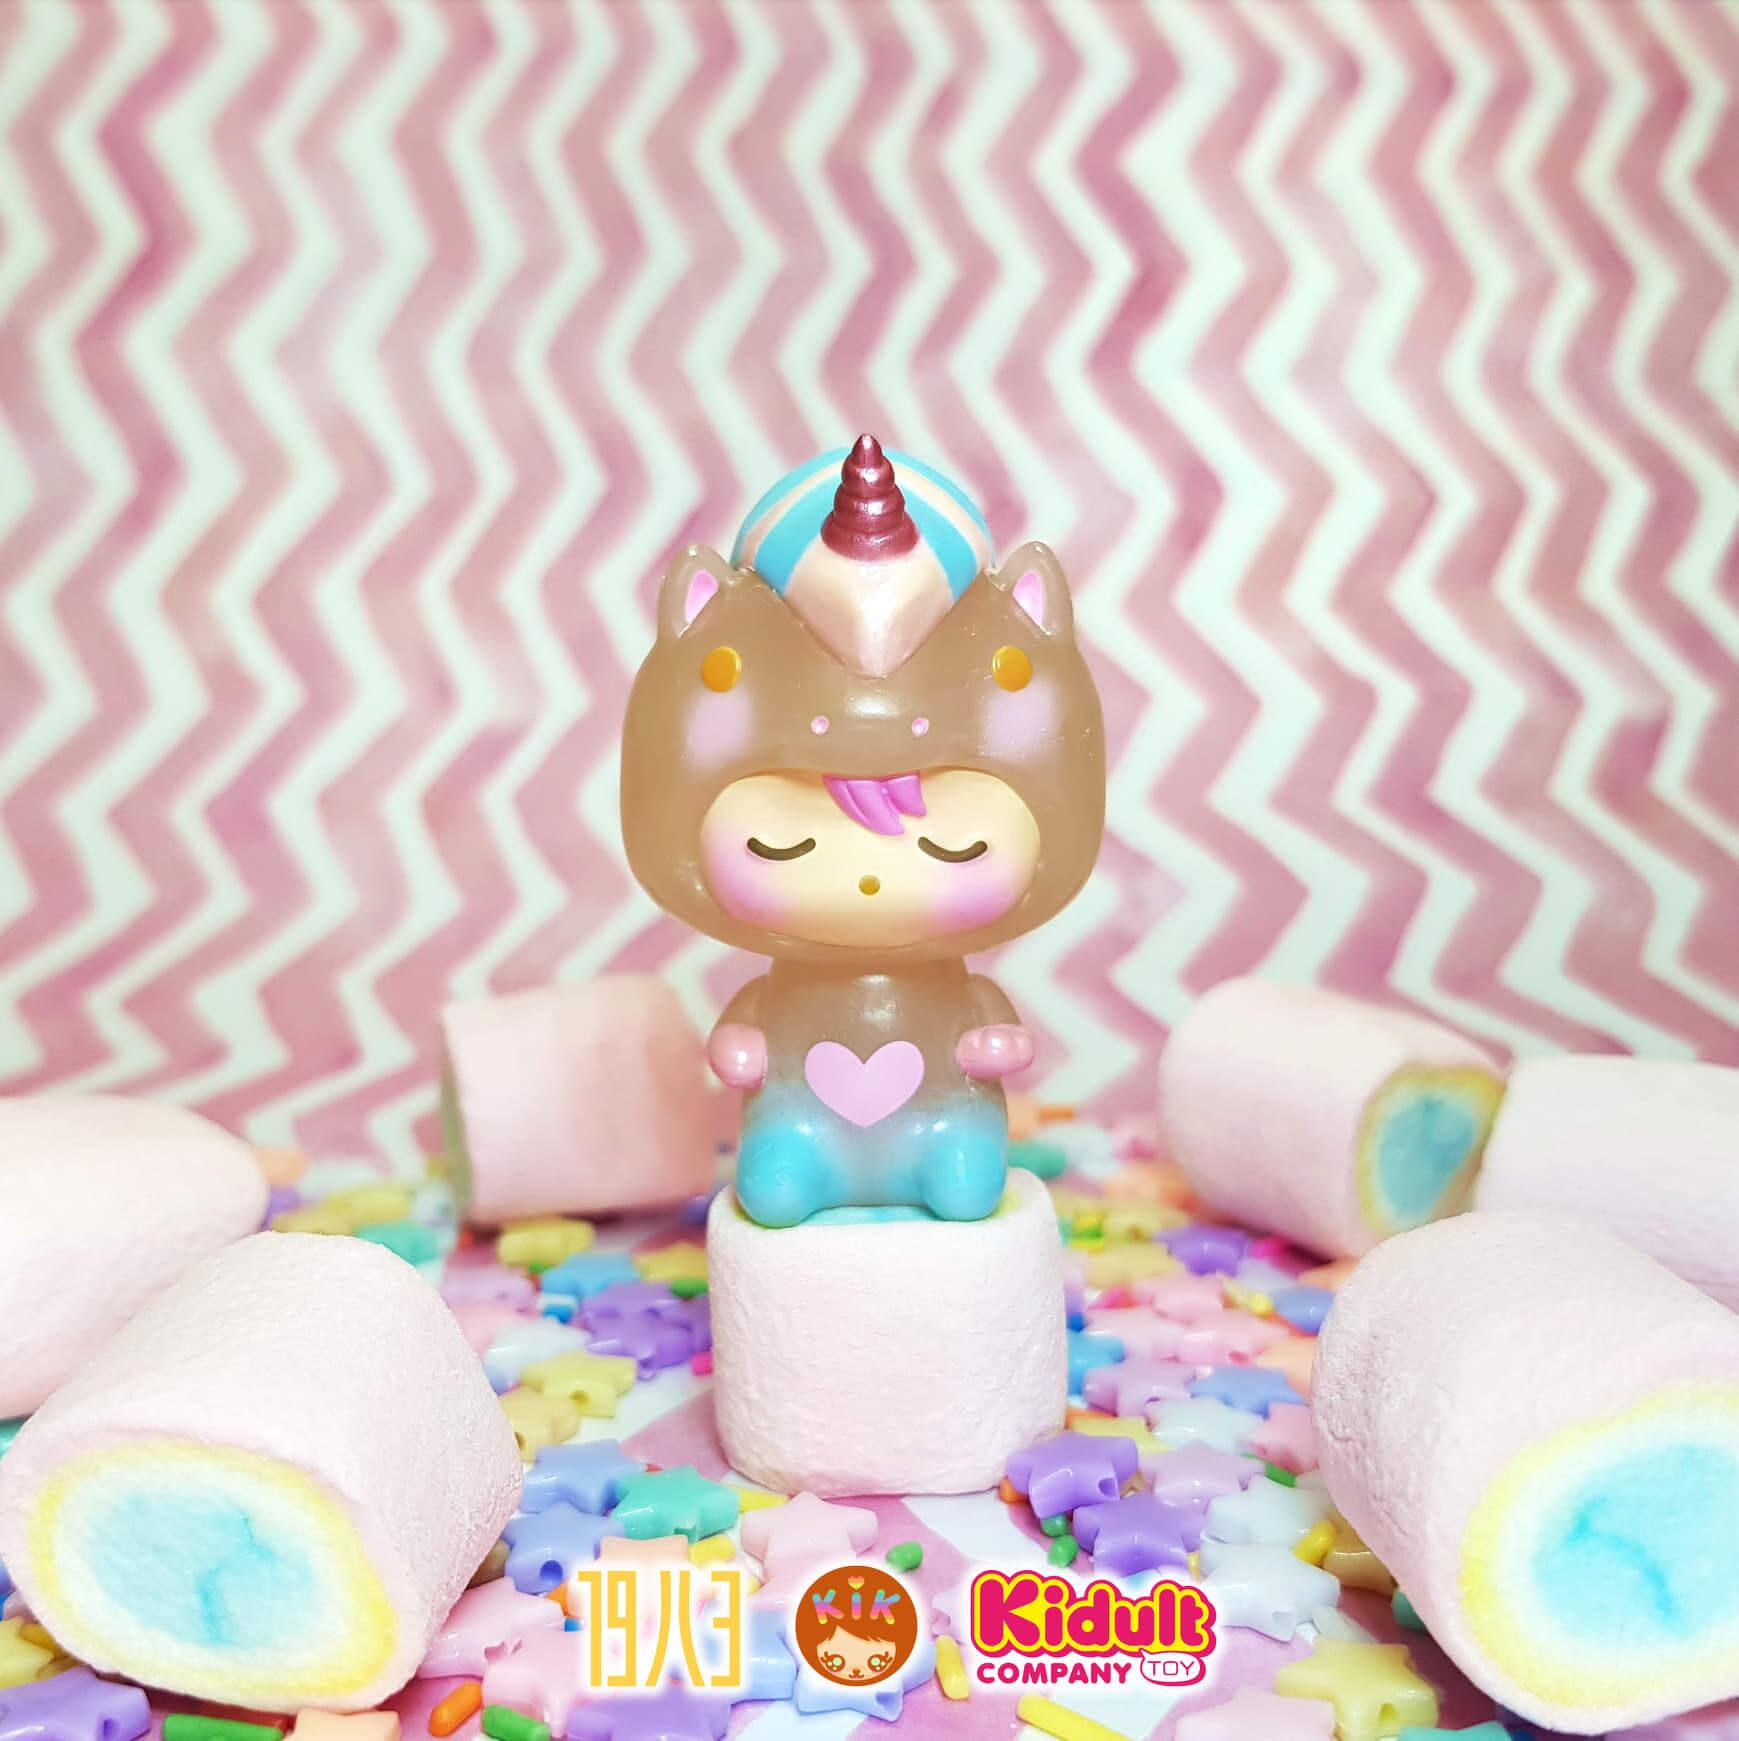 Quay Blind Box Mini Series 2 Jelly Version By Kik Toyz X Kidult Toy Pin Circuit Die Cut Machine Cake On Pinterest It